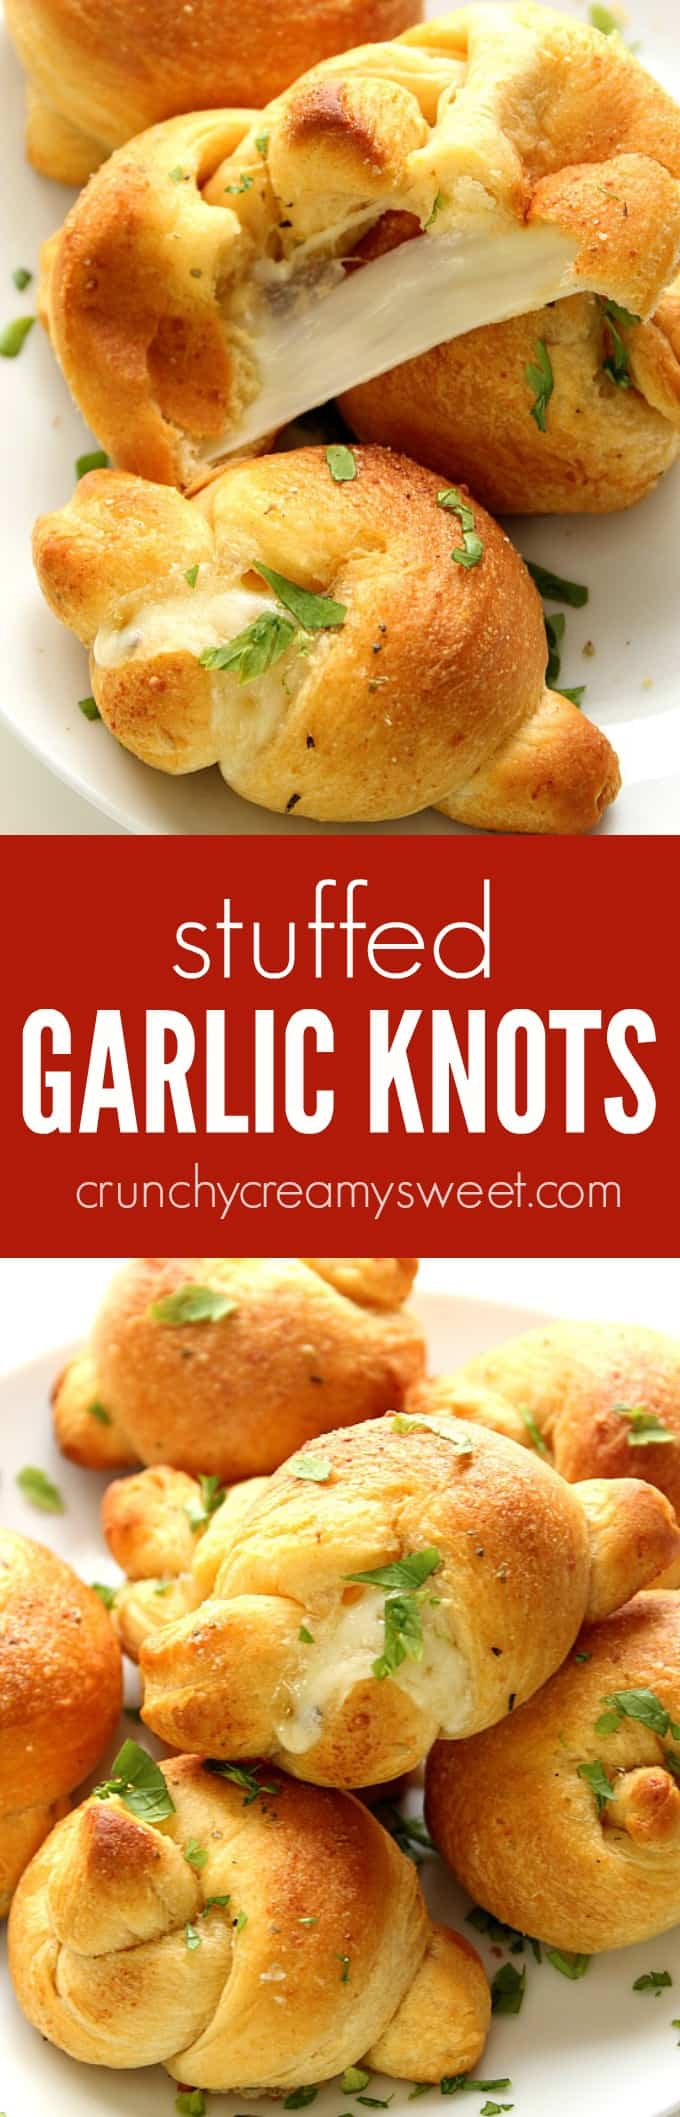 stuffed garlic knots recipe long Stuffed Garlic Knots Recipe